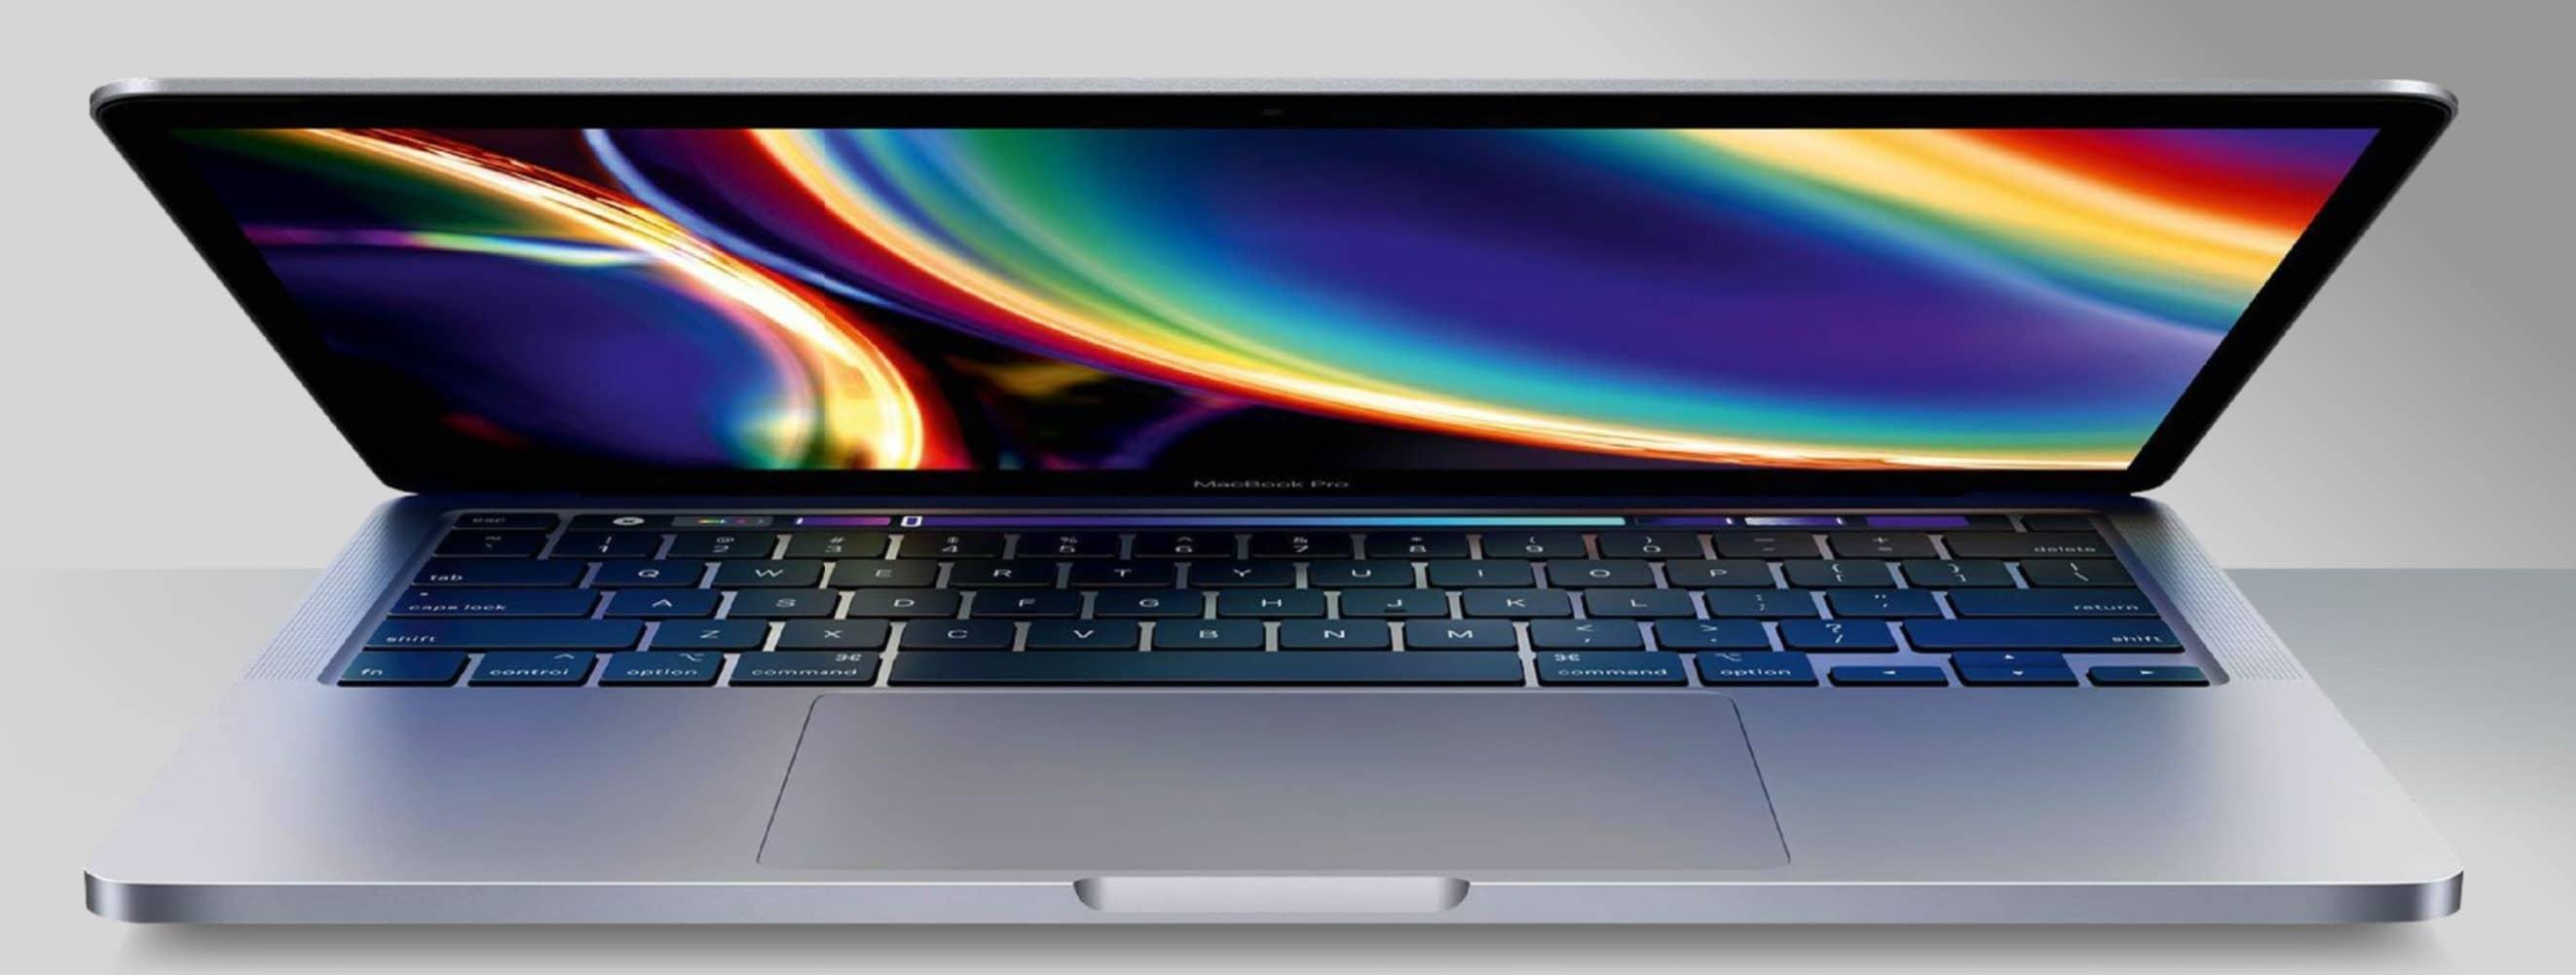 MacBook Pro (13-inch, Mid 2020)